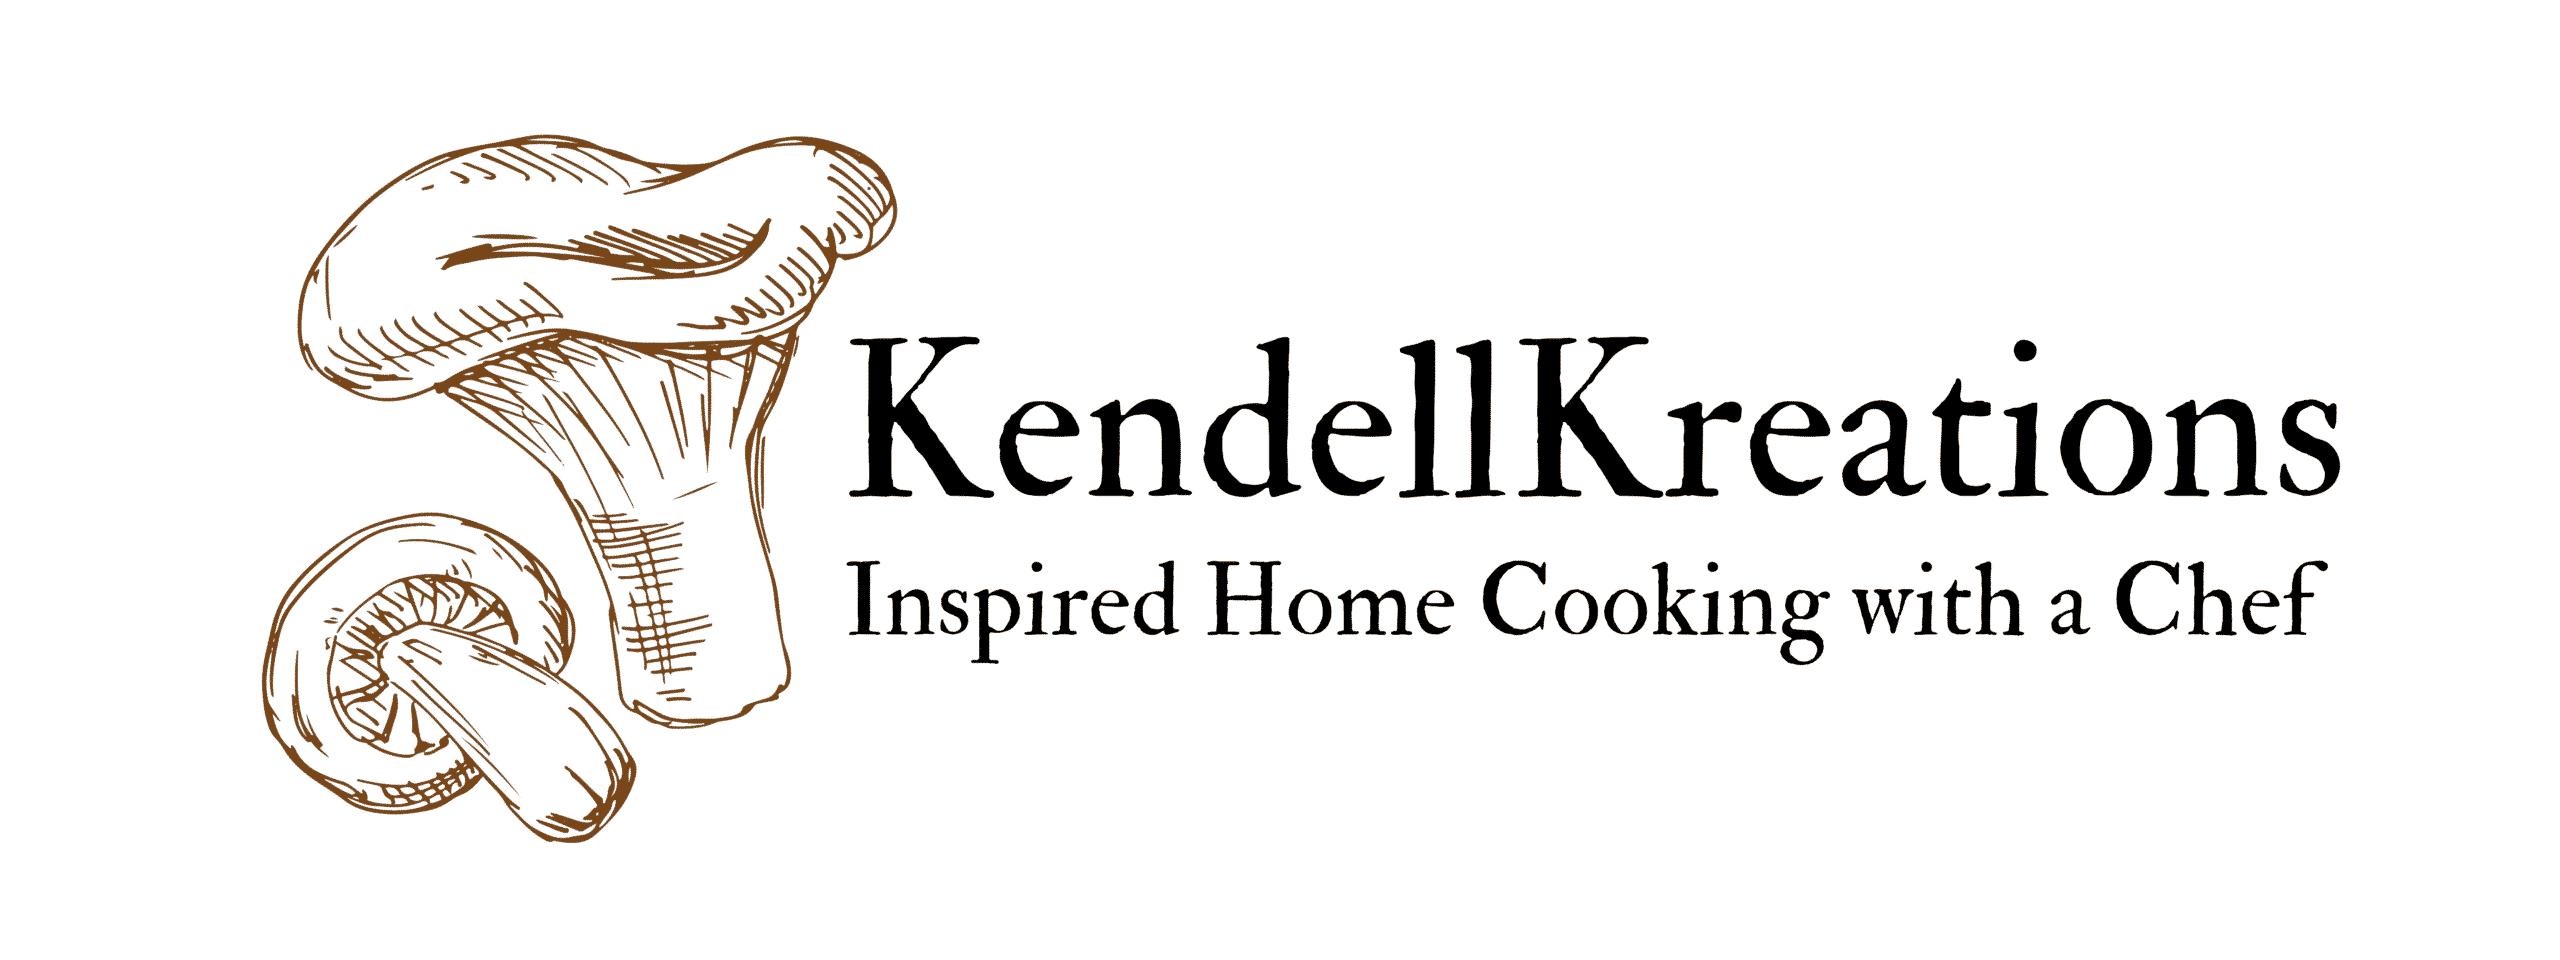 KendellKreations logo